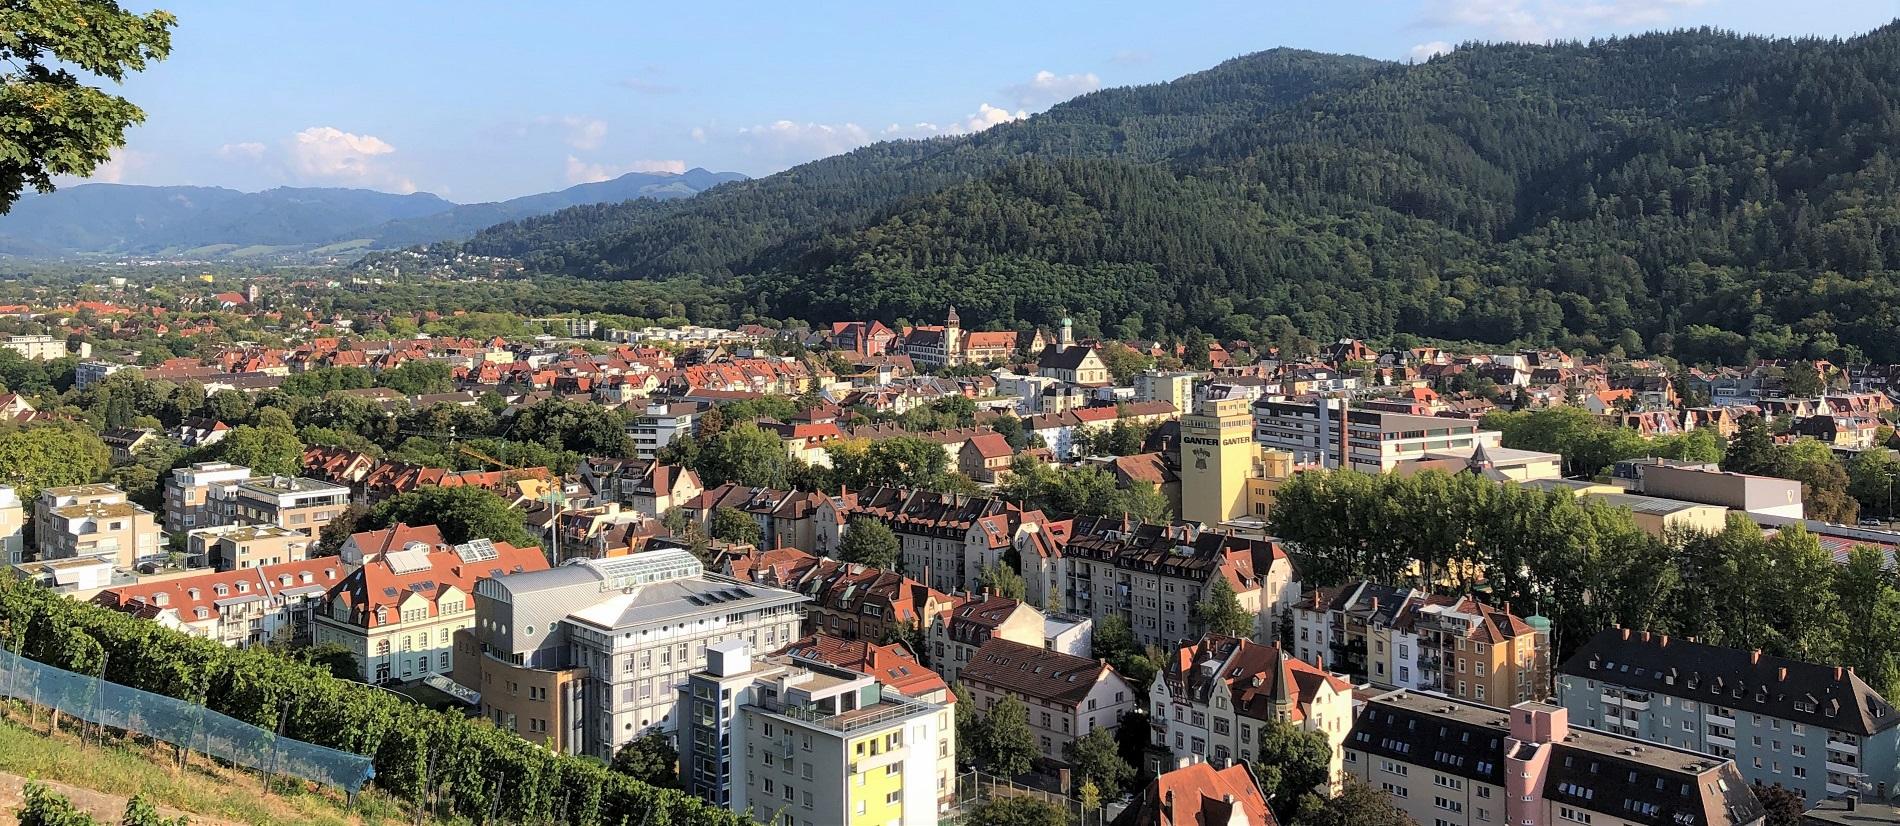 Blick auf Freiburg-Ost_Copyright Barbara-Ketzer-Beck